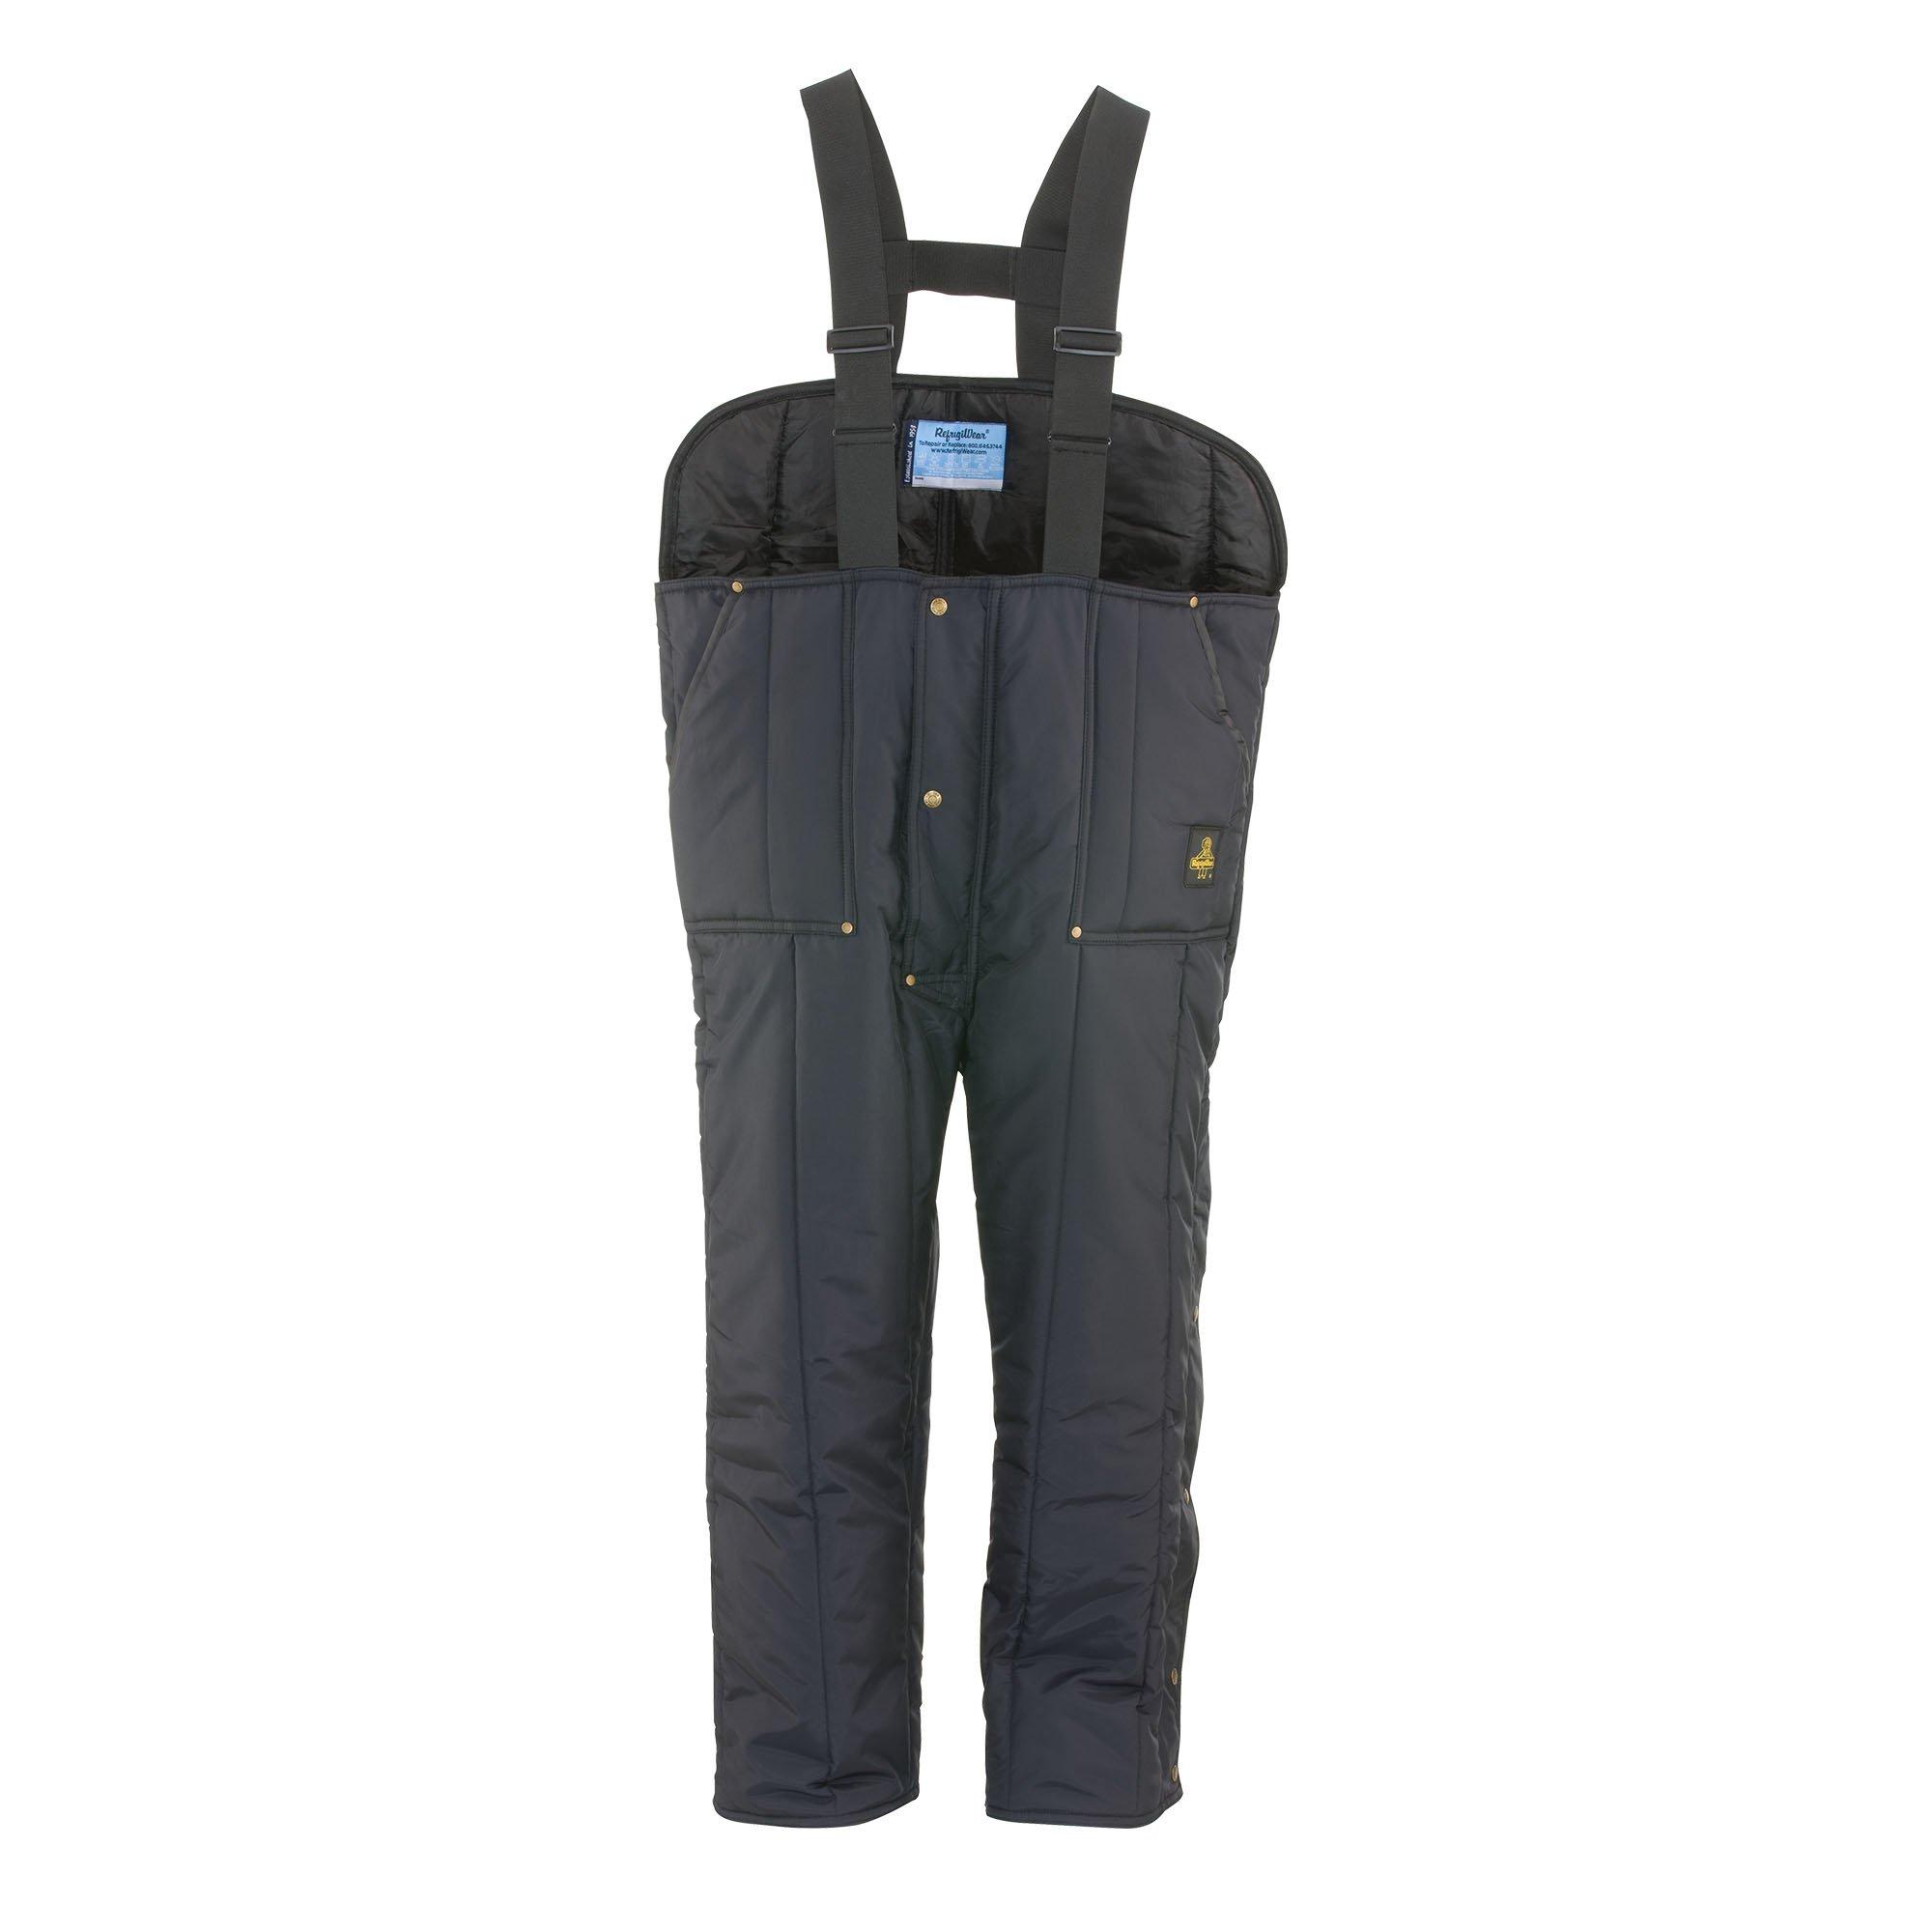 RefrigiWear Men's Iron-Tuff Low Bib Overalls, Navy, 3XL